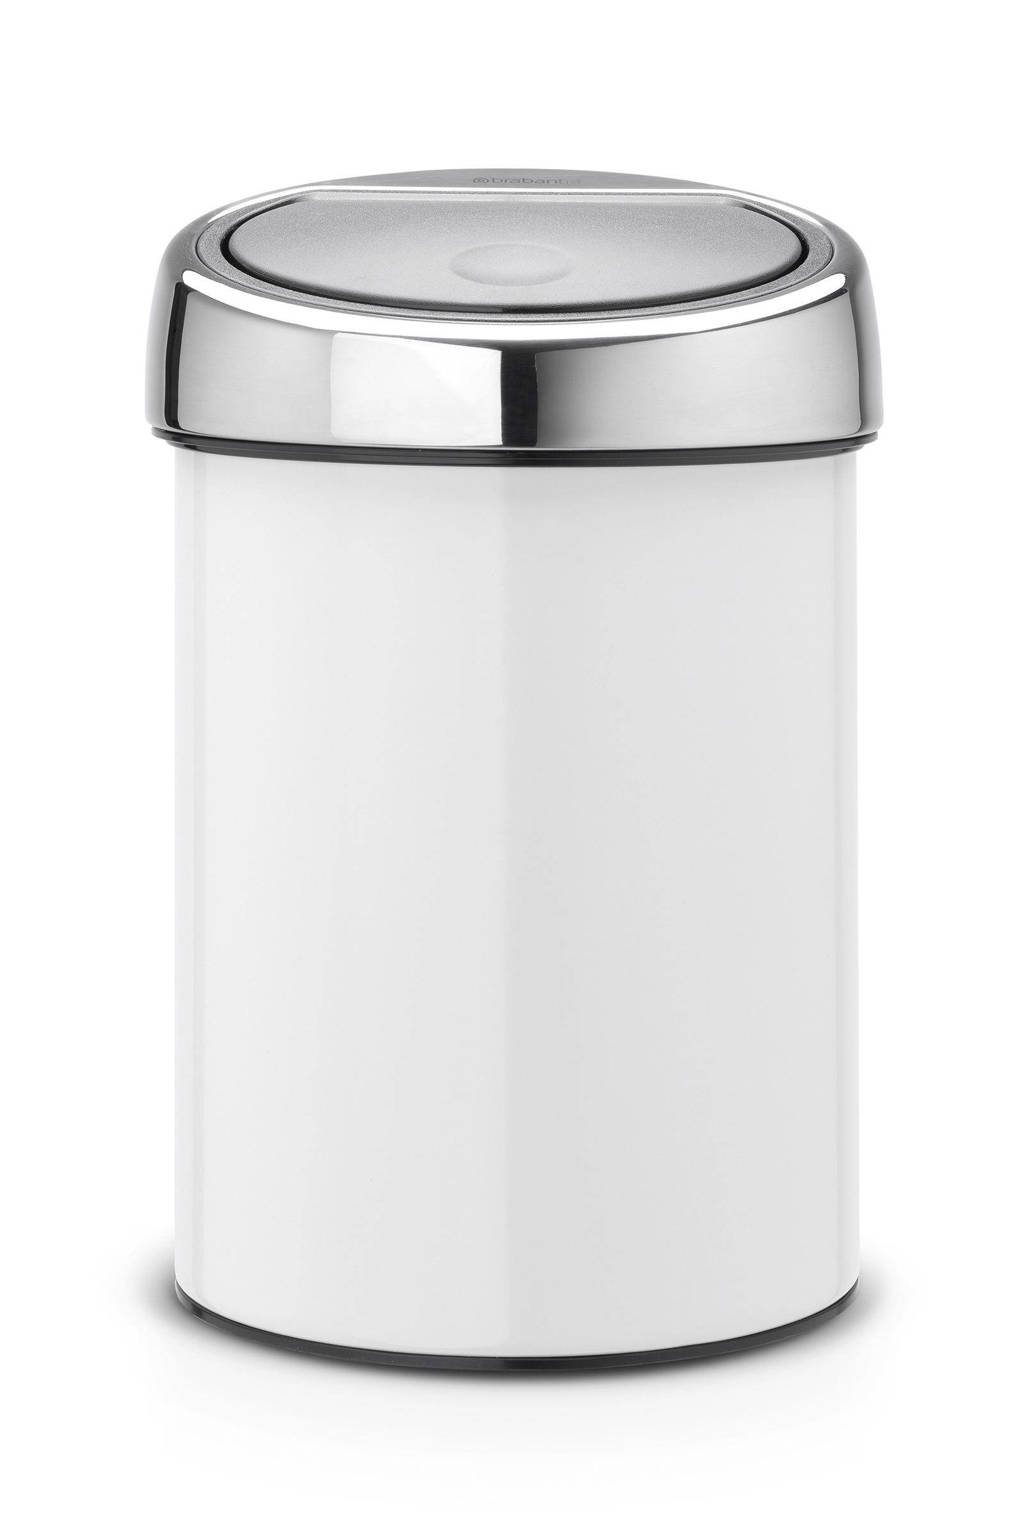 Brabantia 30 Liter Afvalemmer.Brabantia Touch Bin 3 Liter Afvalemmer Wehkamp